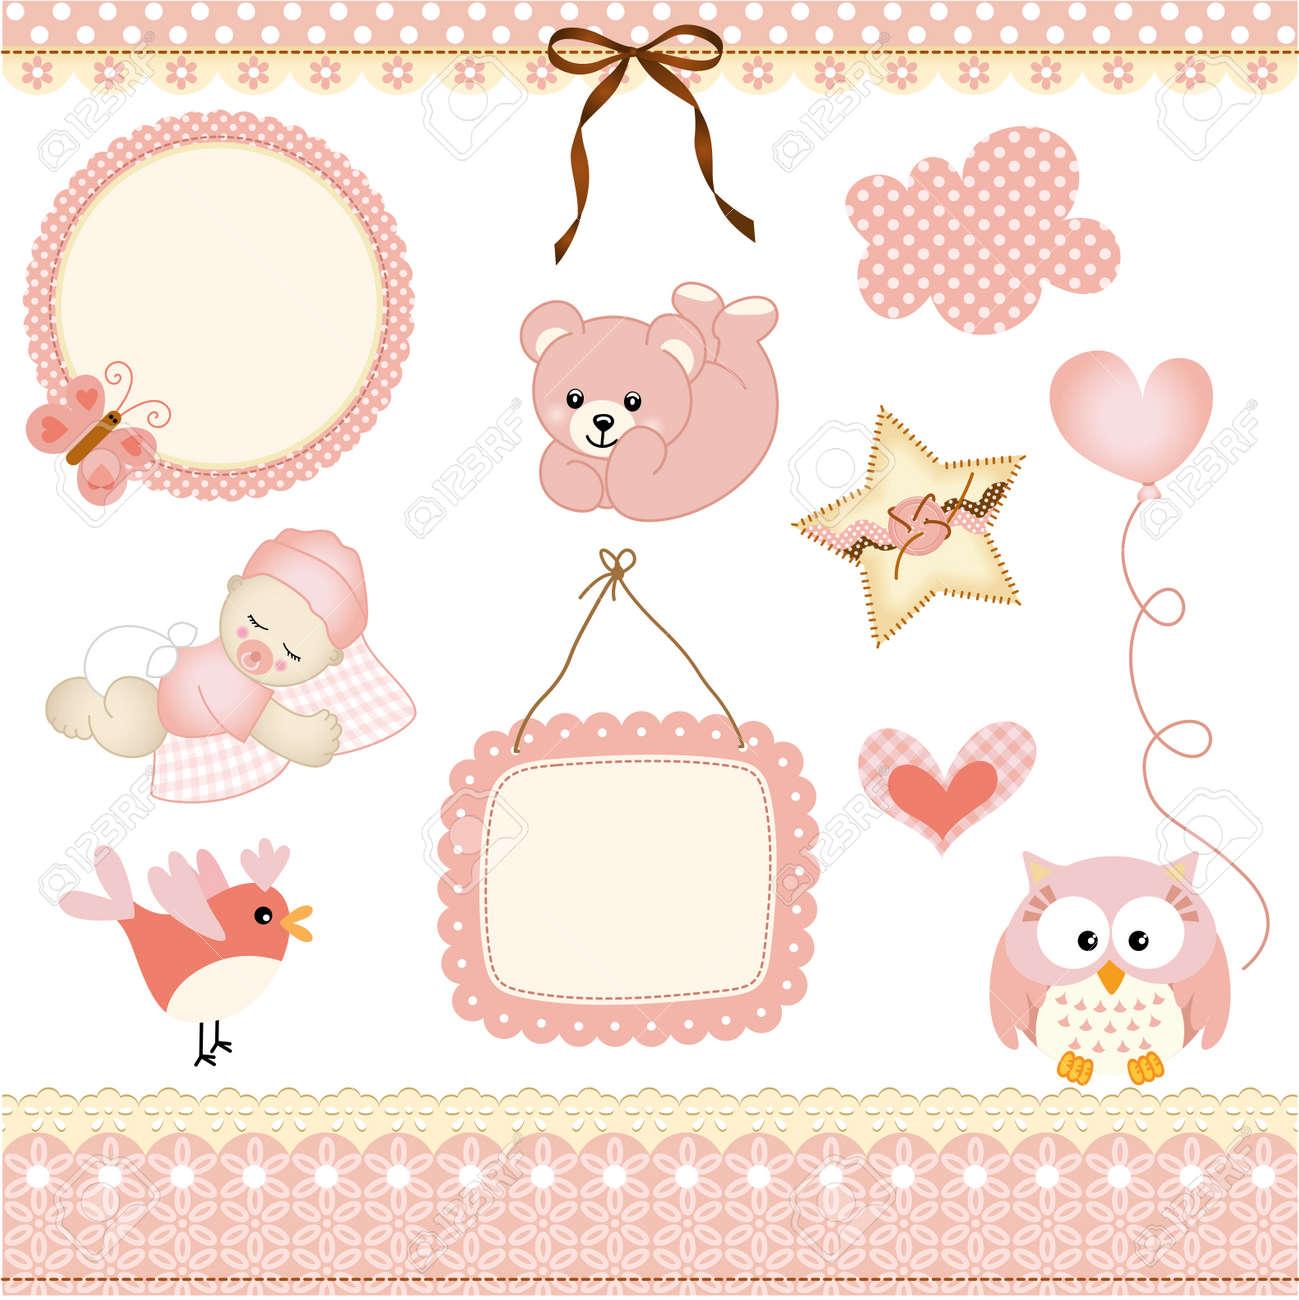 Baby girl design elements - 19877547